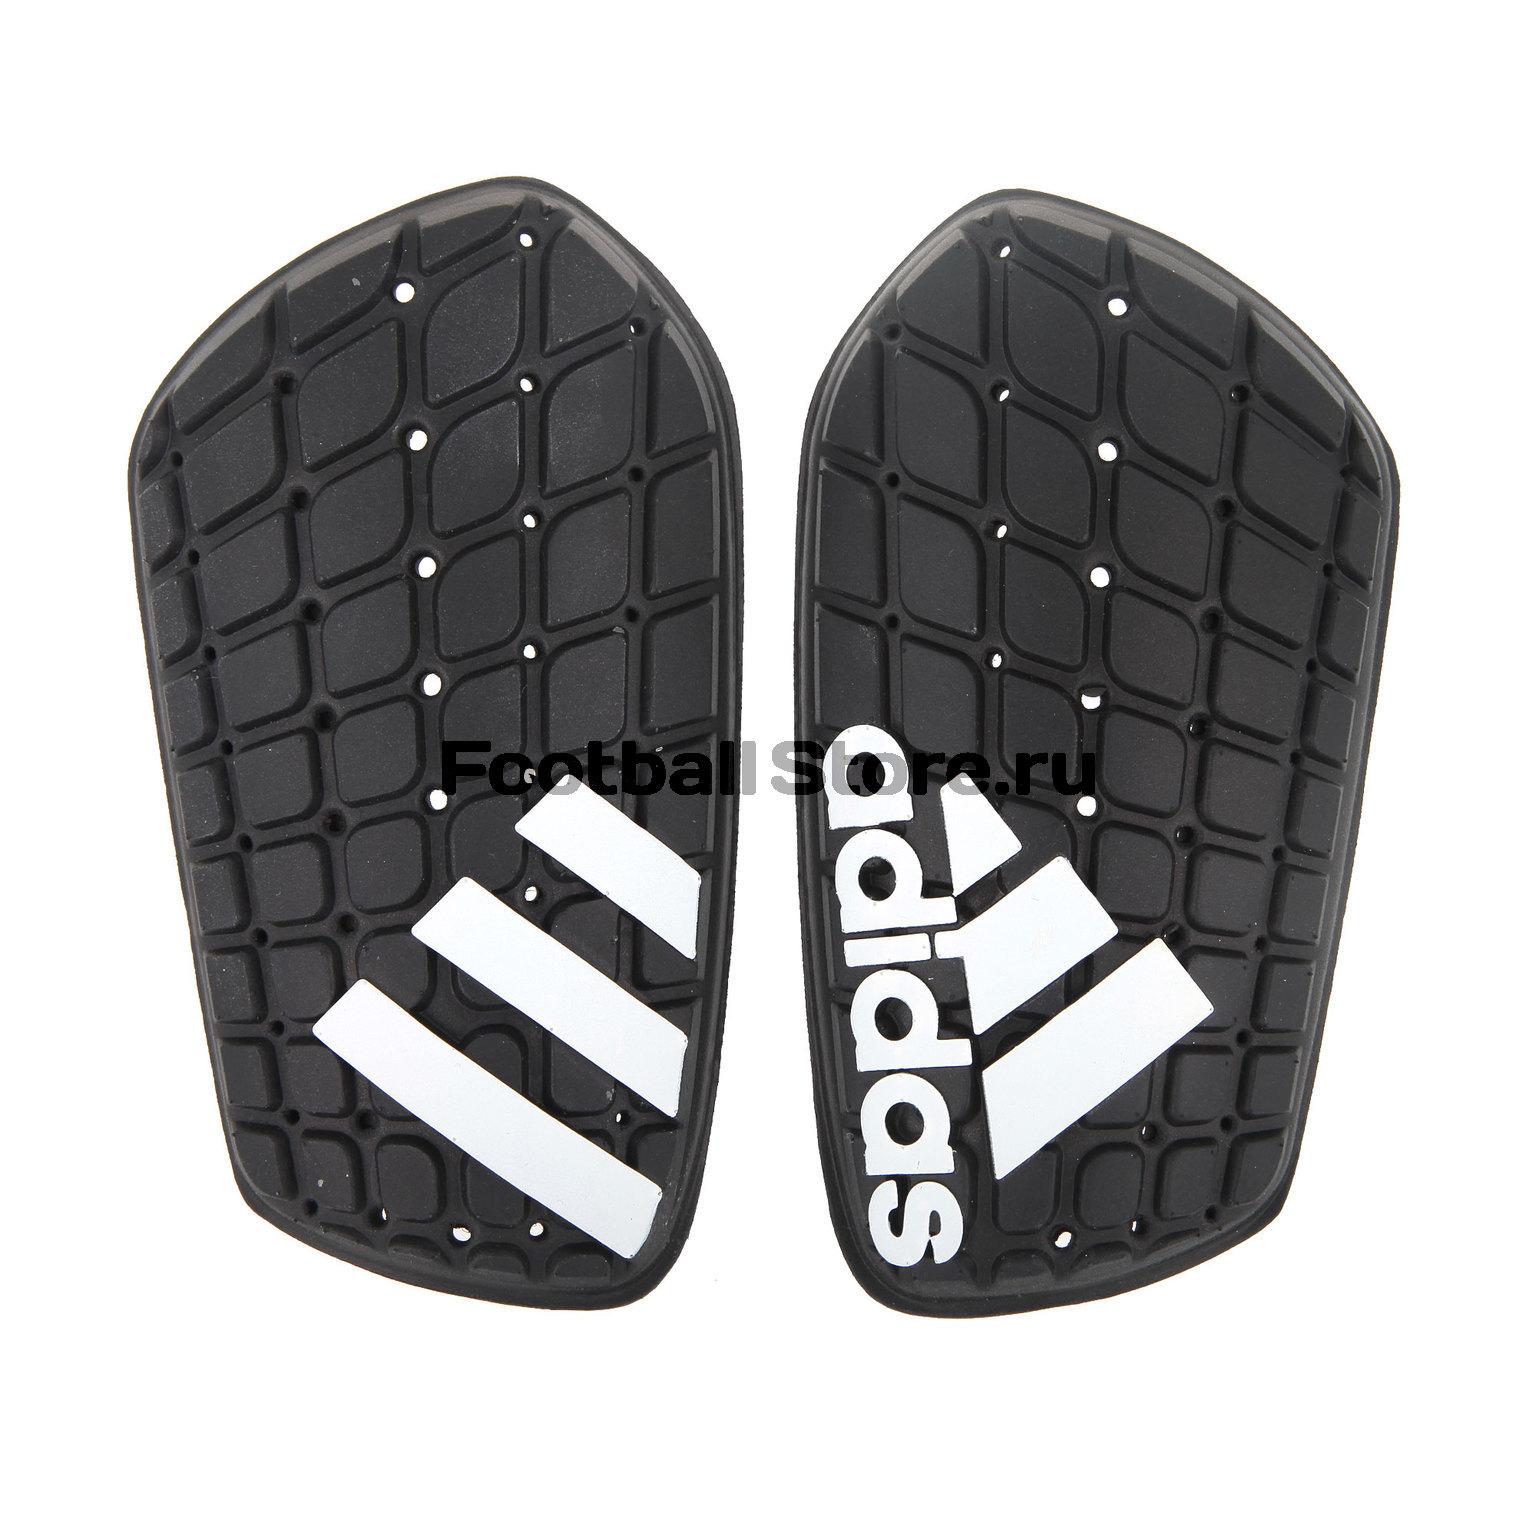 все цены на Защита ног Adidas Щитки Adidas Ghost CC AZ3708 онлайн